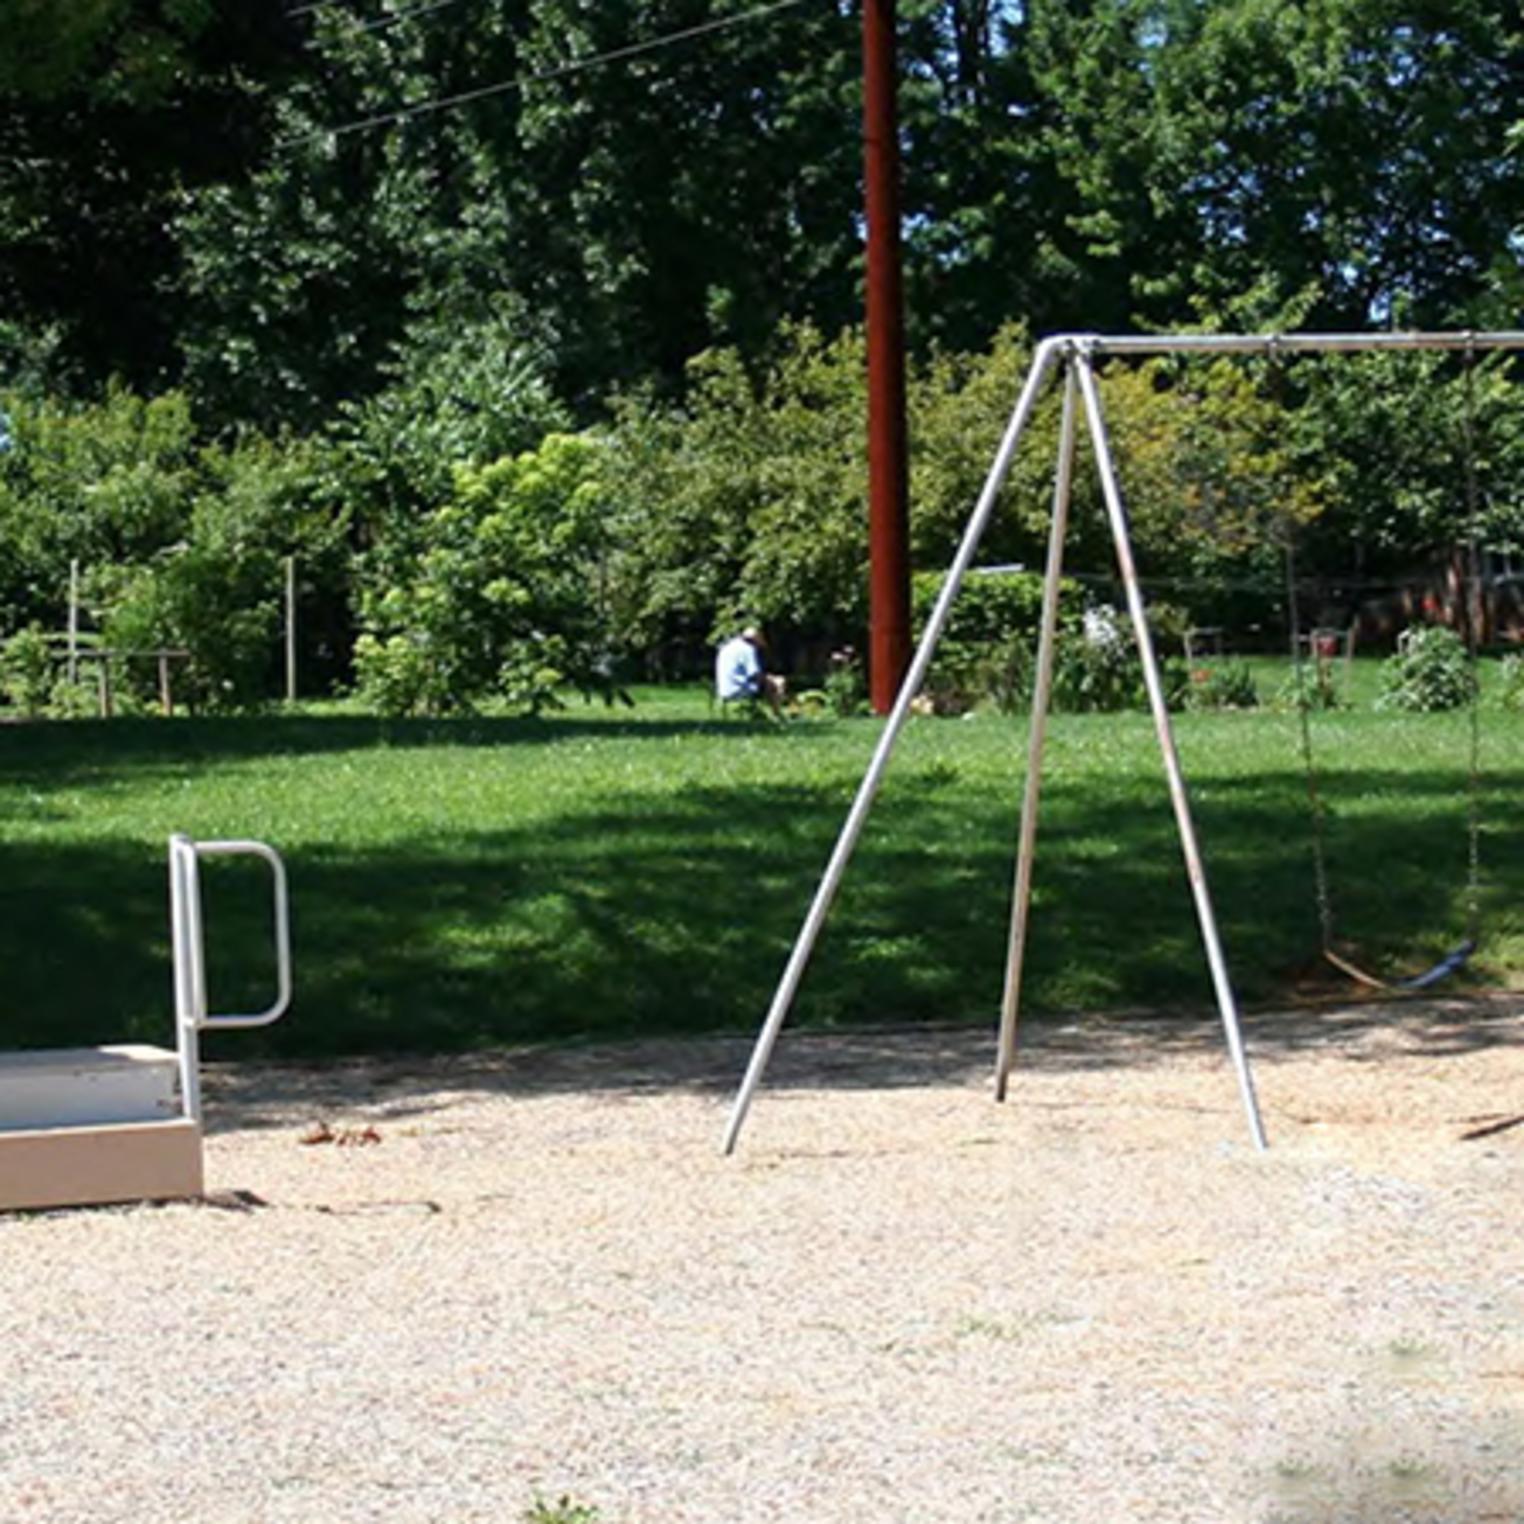 Millers Crest Park